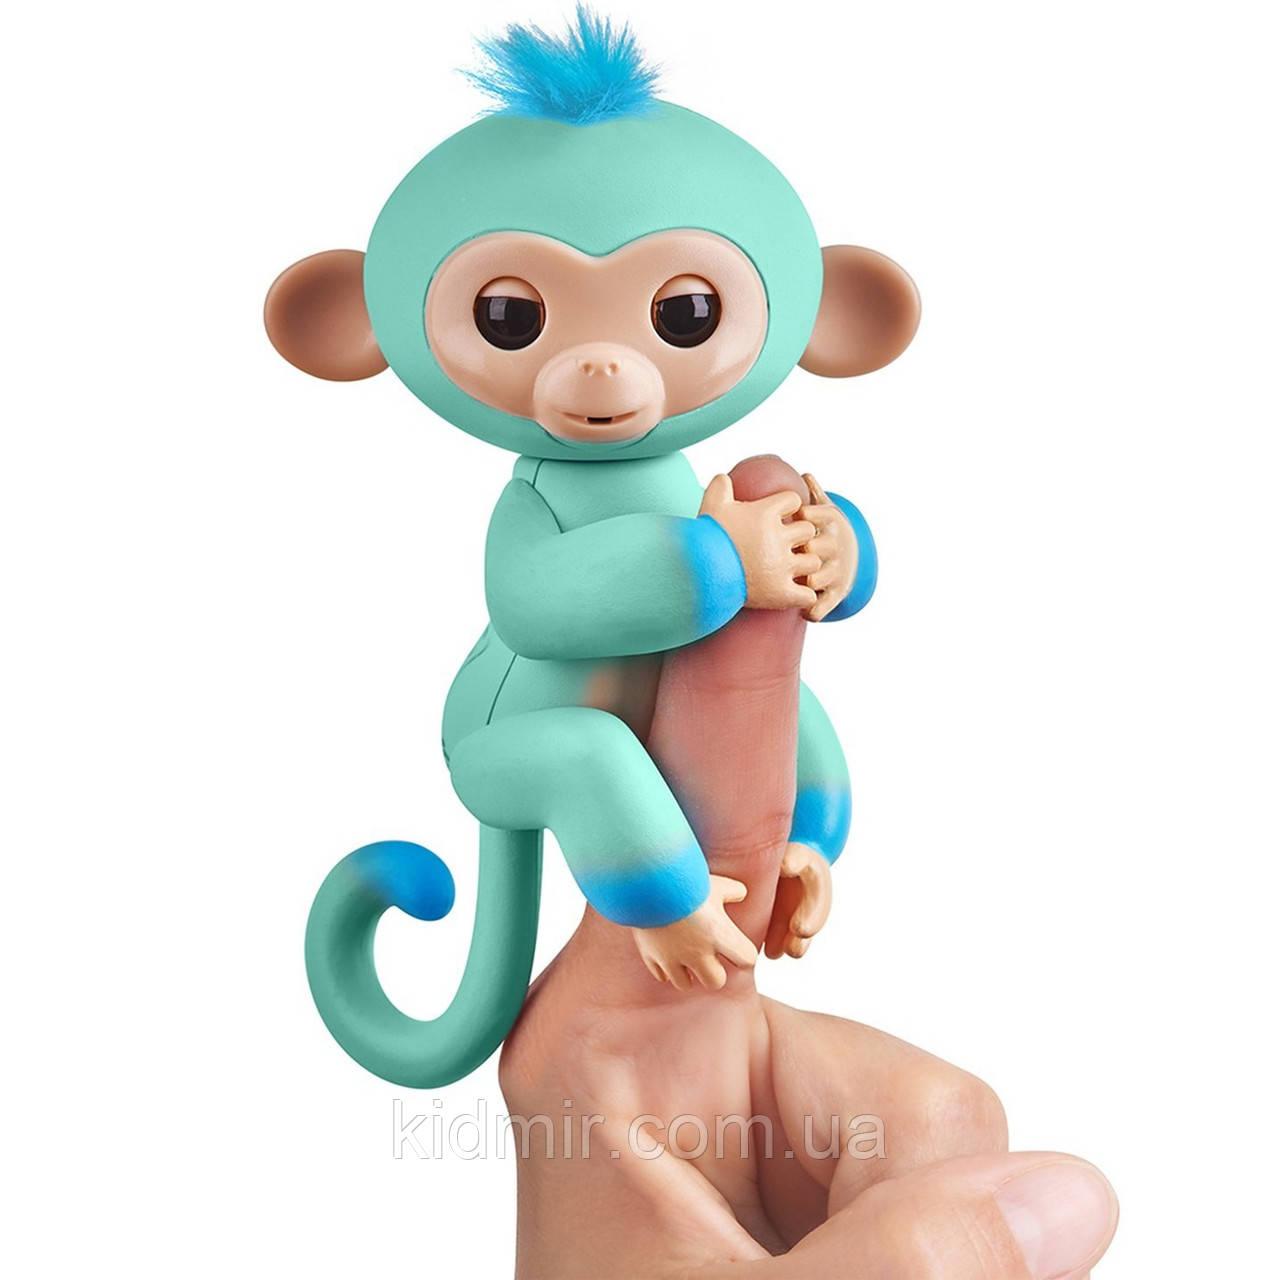 Обезьянка интерактивная Эдди Fingerlings Monkey WowWee Оригинал